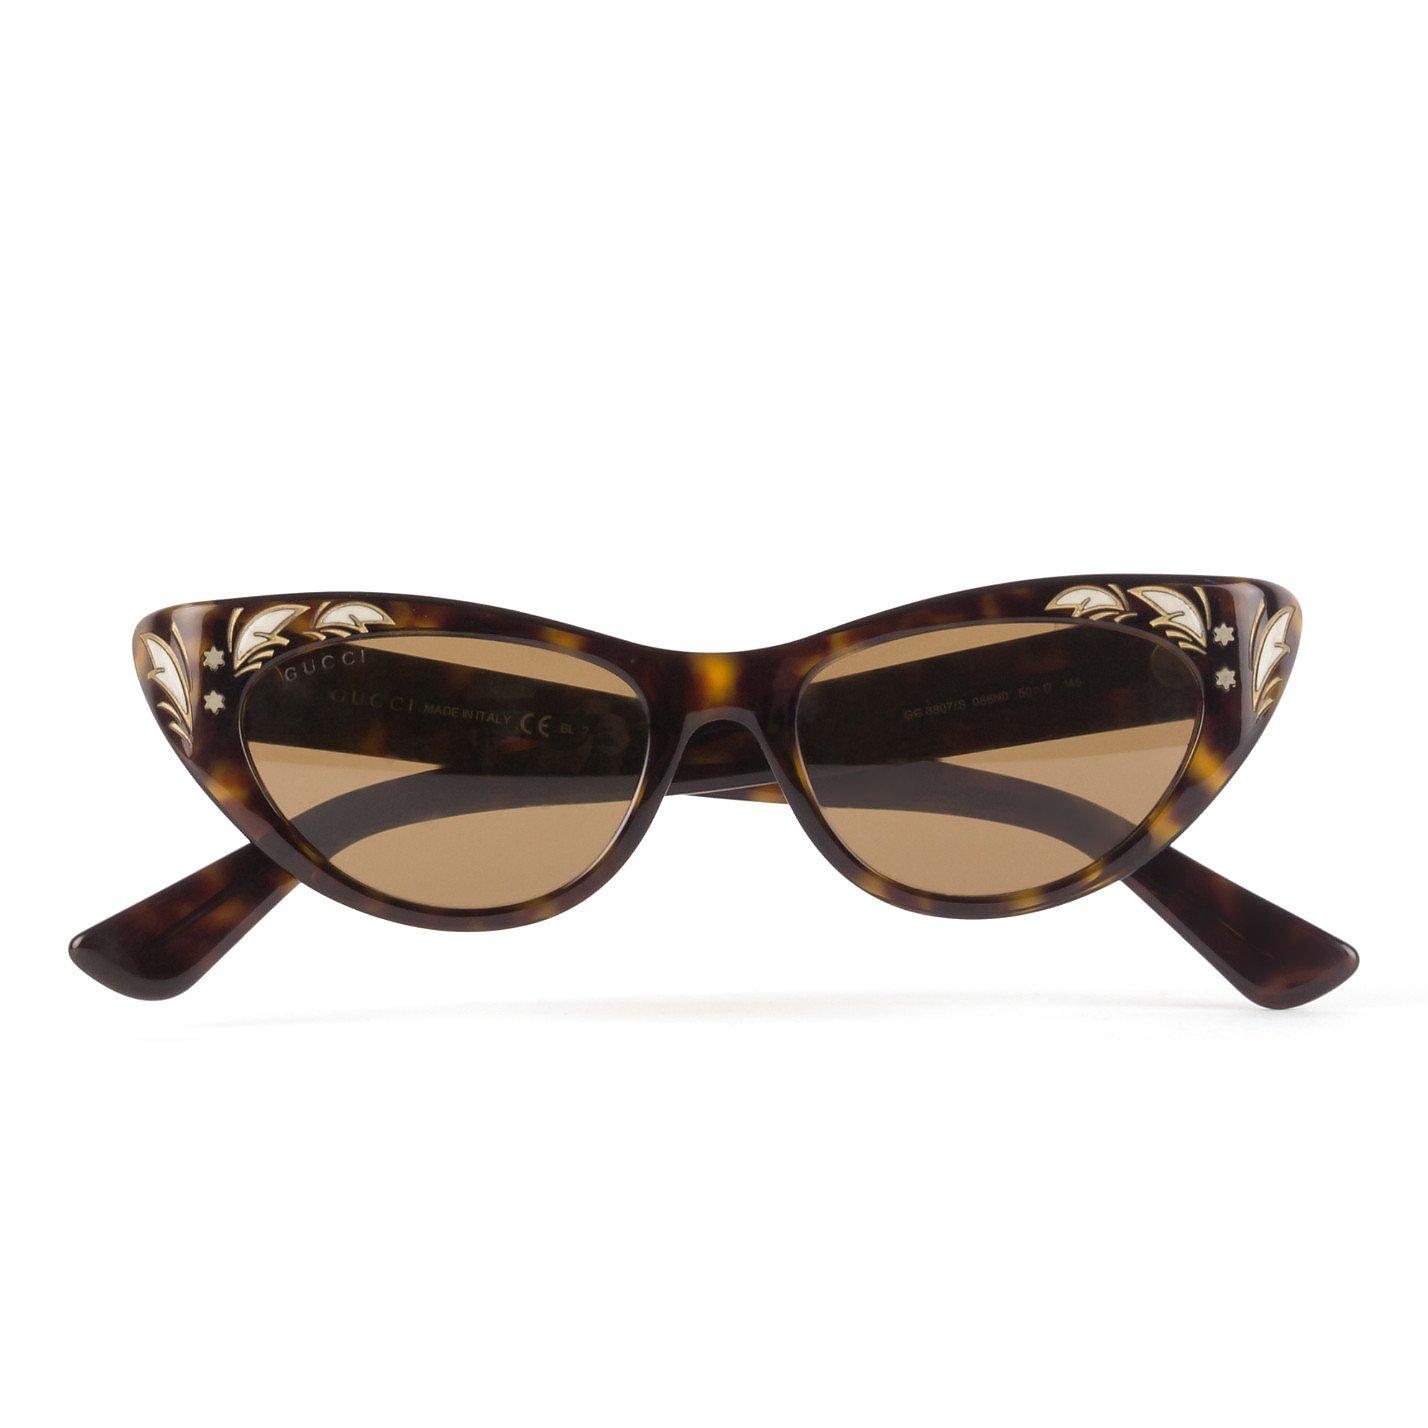 Gucci Tortoise Shell Sunglasses